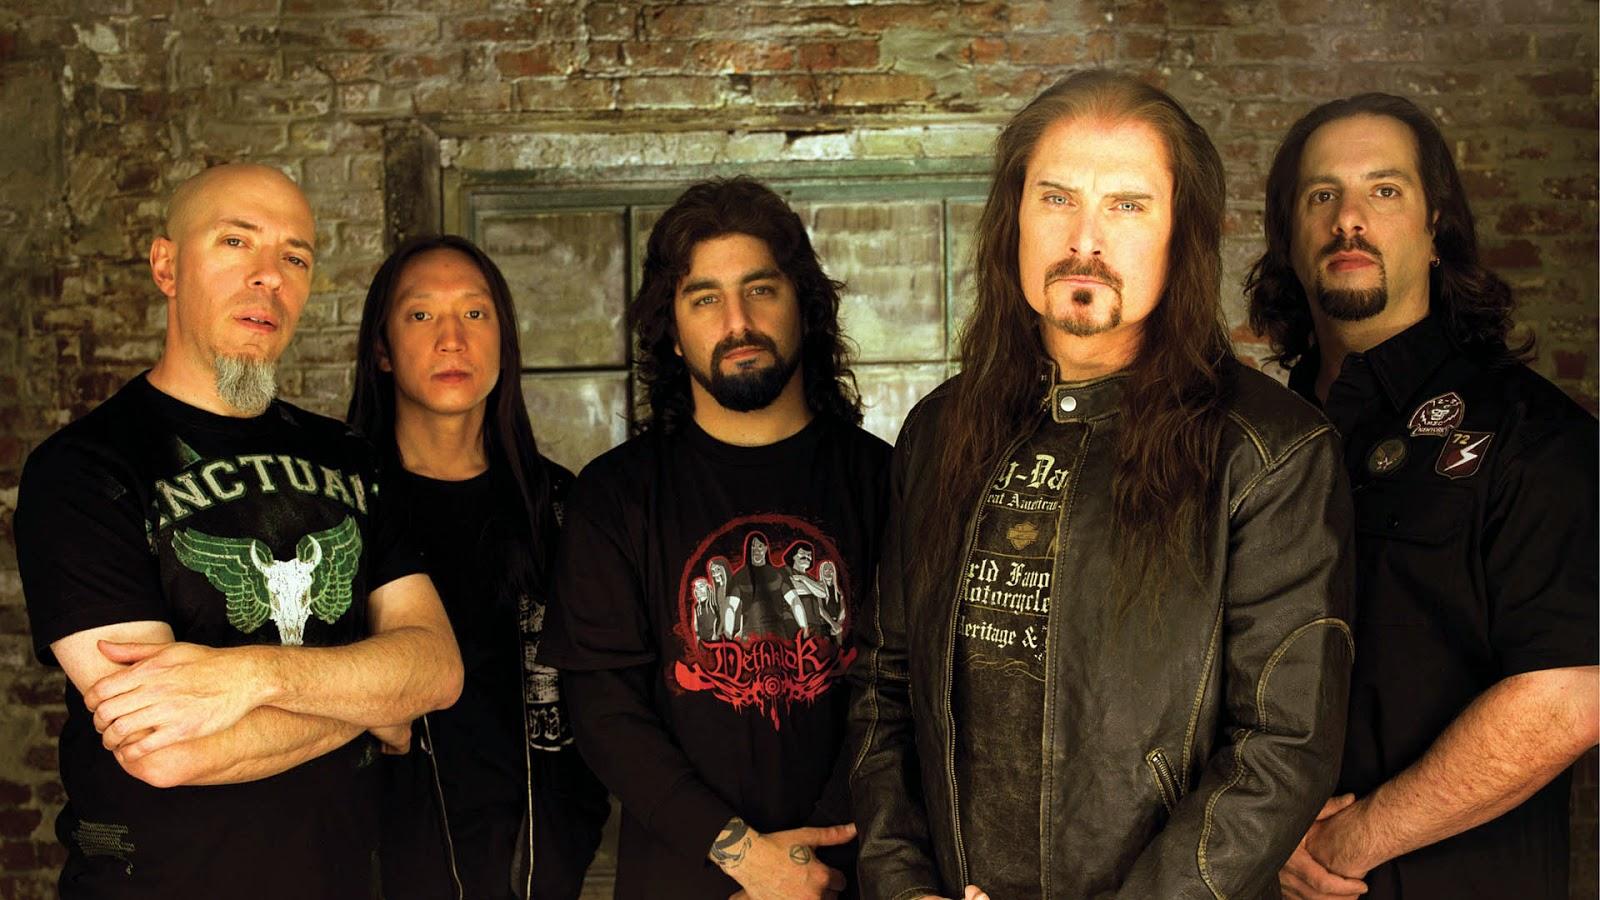 Sejarah dan Biografi Lengkap Band Dream Theater